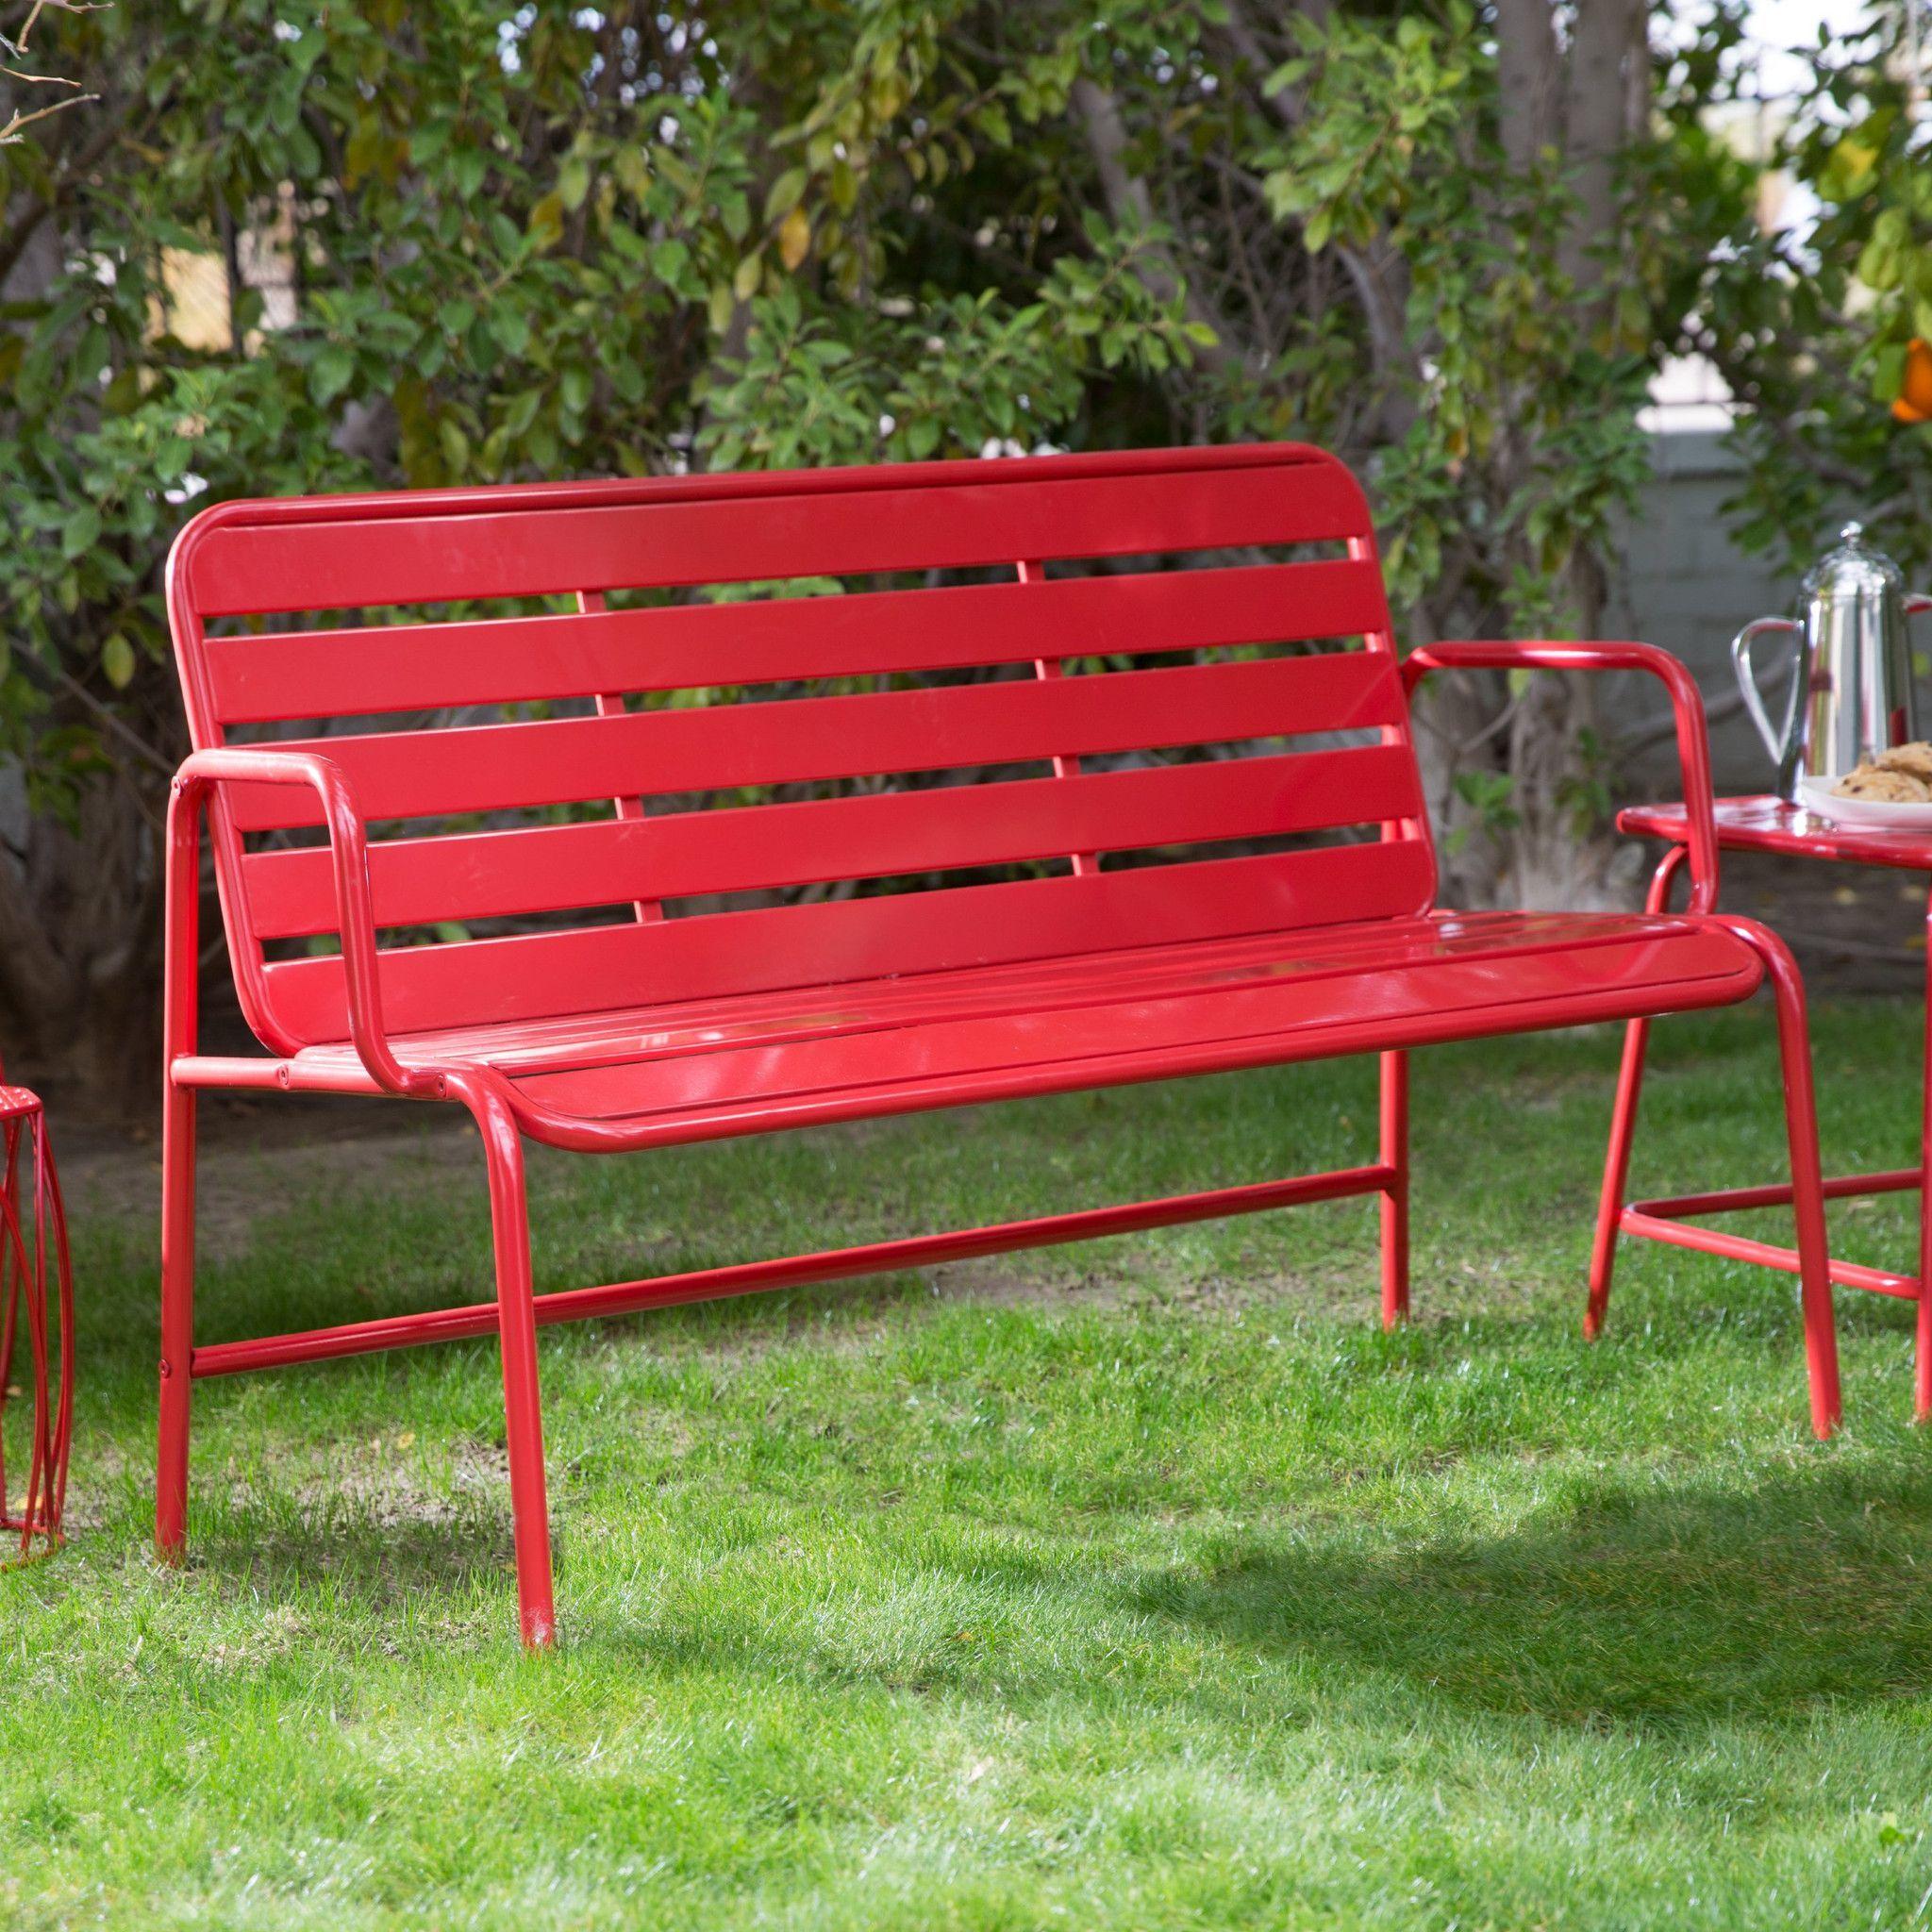 Red Metal Slat Outdoor Patio Garden Bench Products